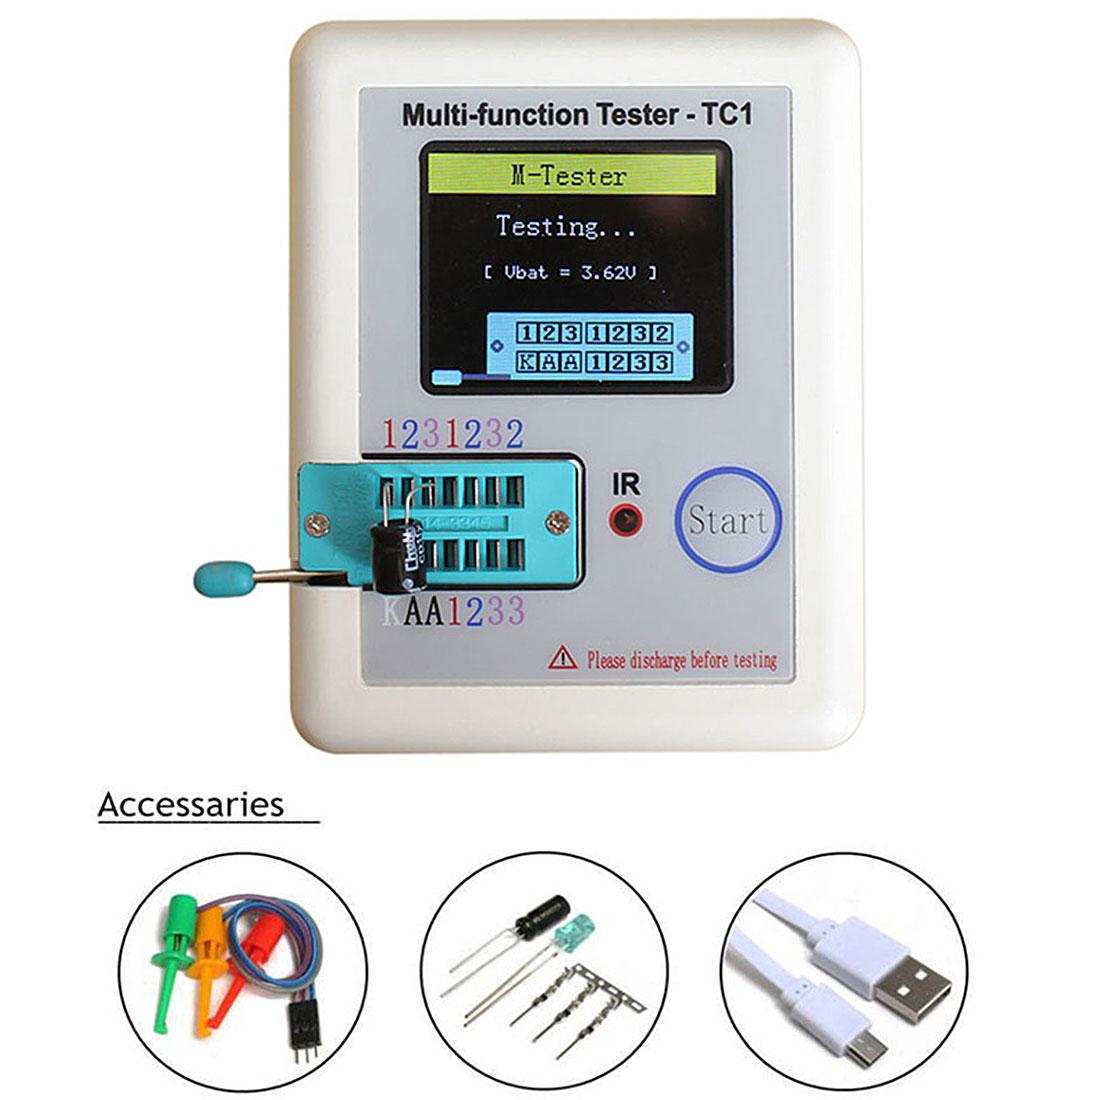 Kitteltasche Transistor Tester ist Die LCR-TC1 Volle Farbe Graphics Display